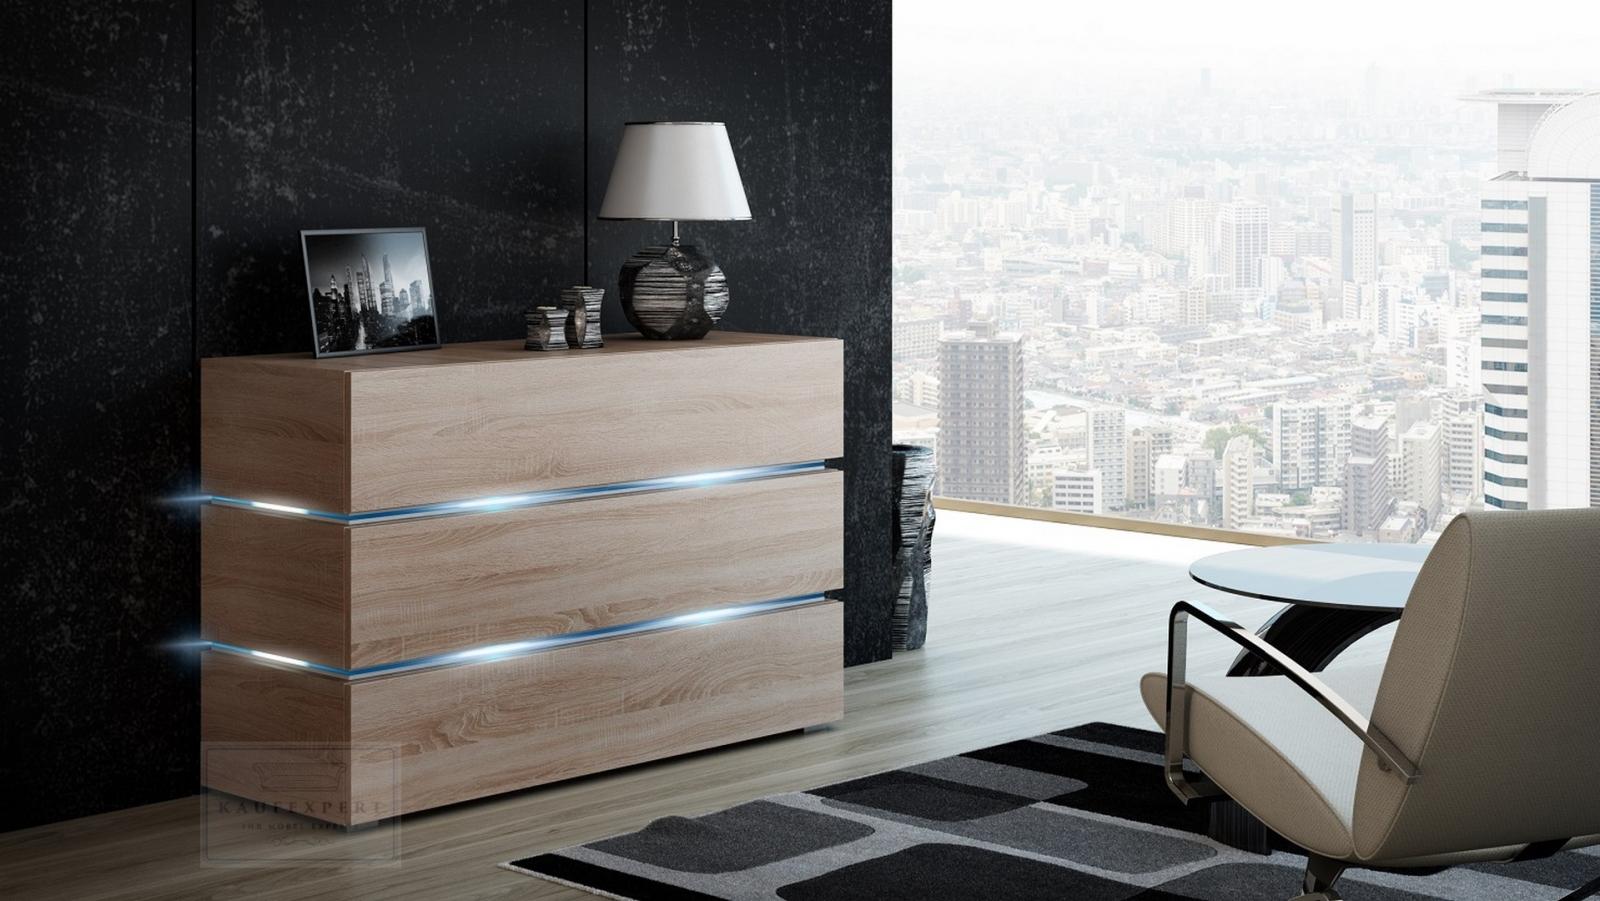 kaufexpert wohnwand dream sonoma eiche matt 332 cm. Black Bedroom Furniture Sets. Home Design Ideas